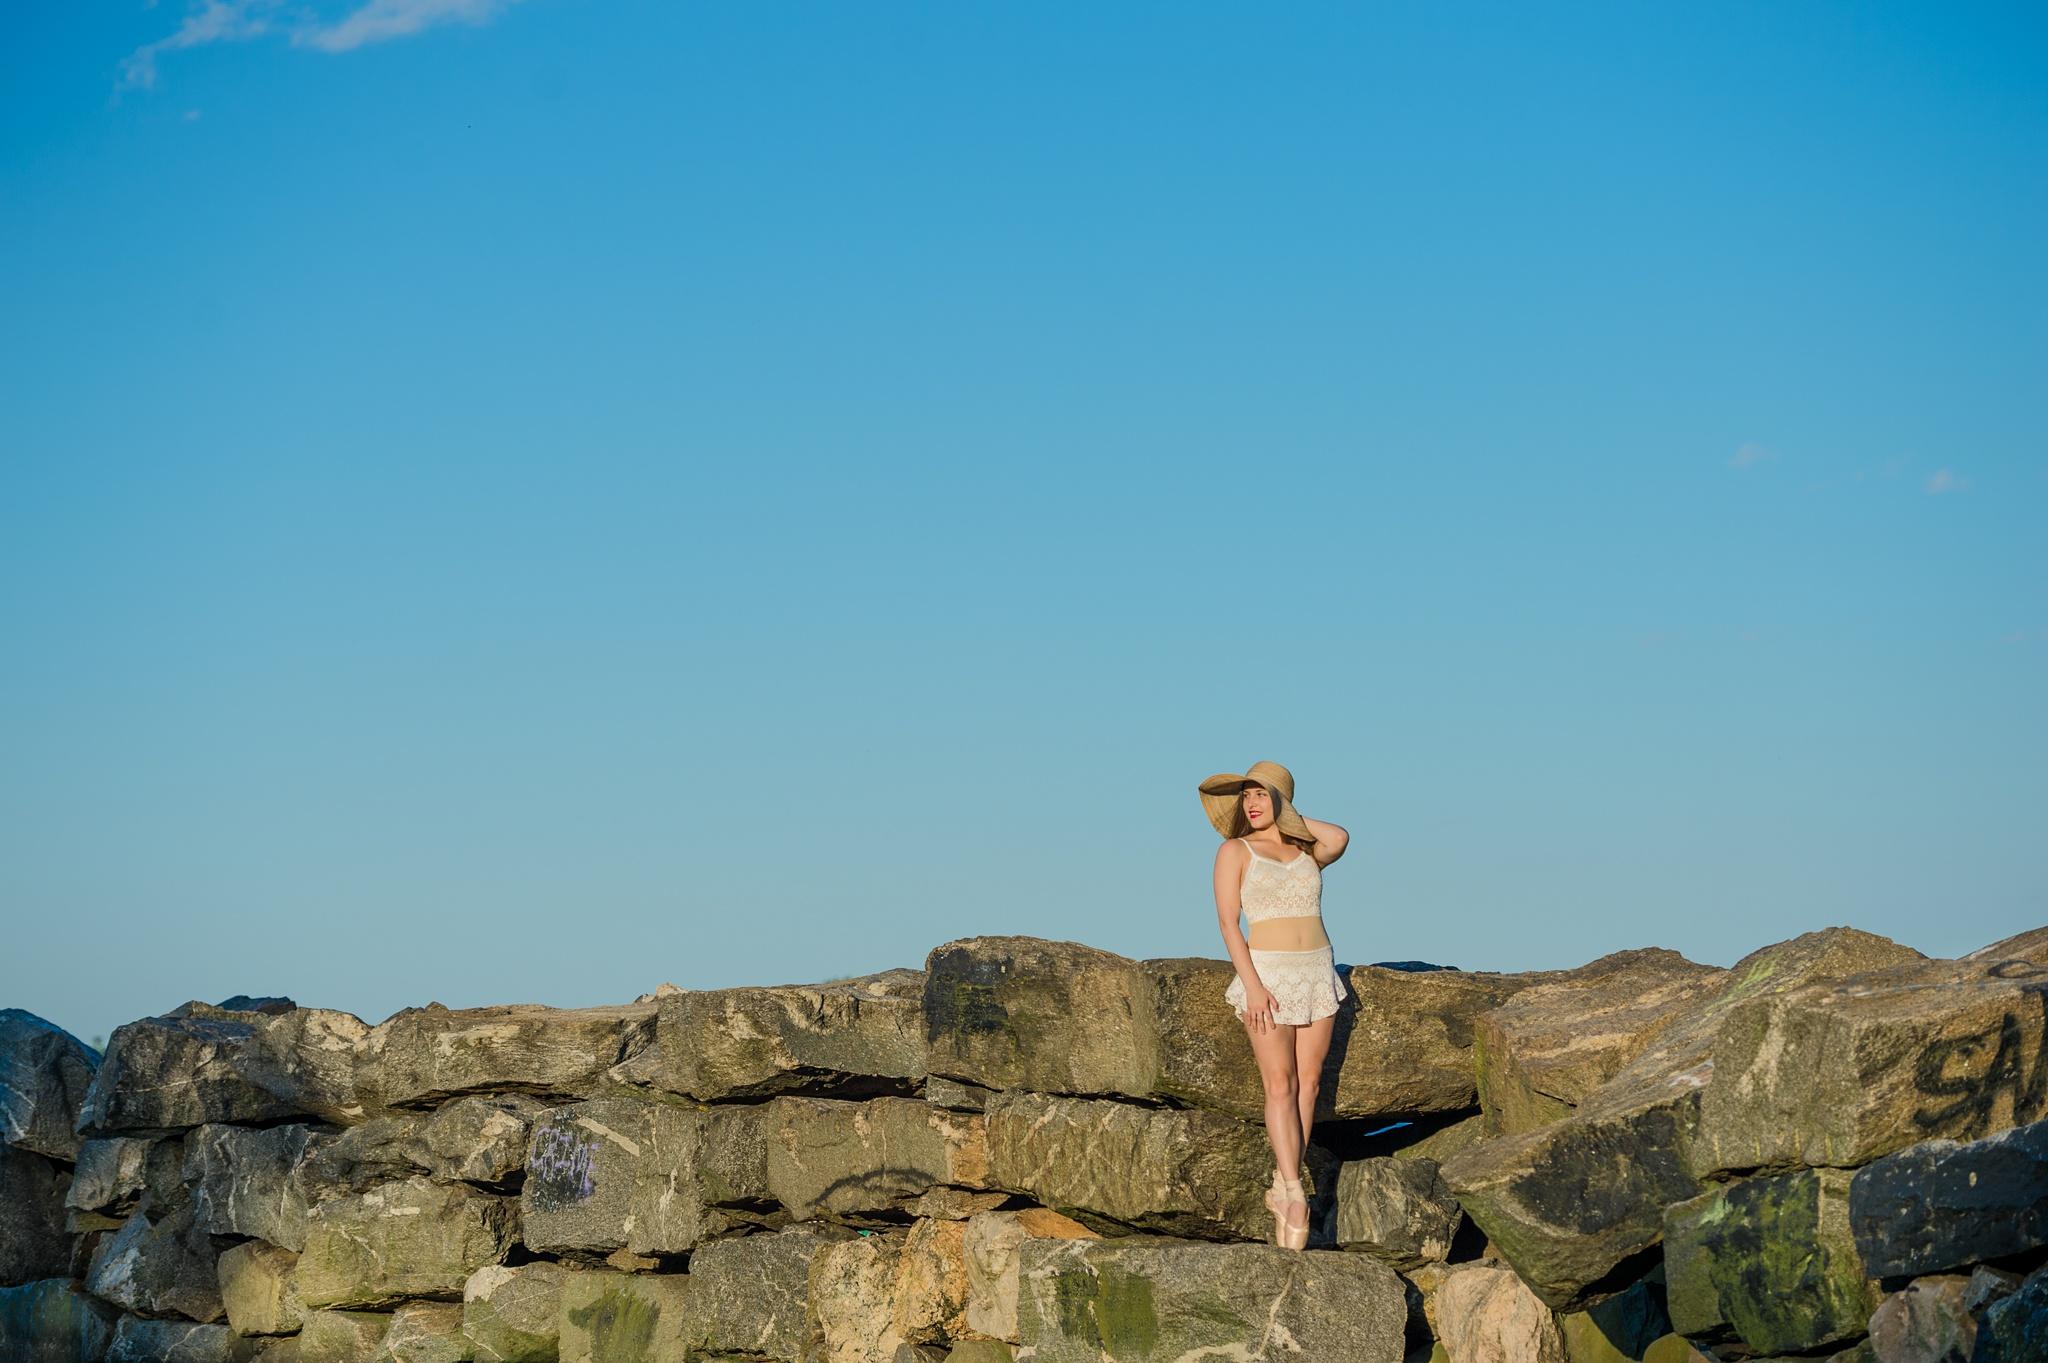 Leandra Brown | Washington D.C. Dance Photographer